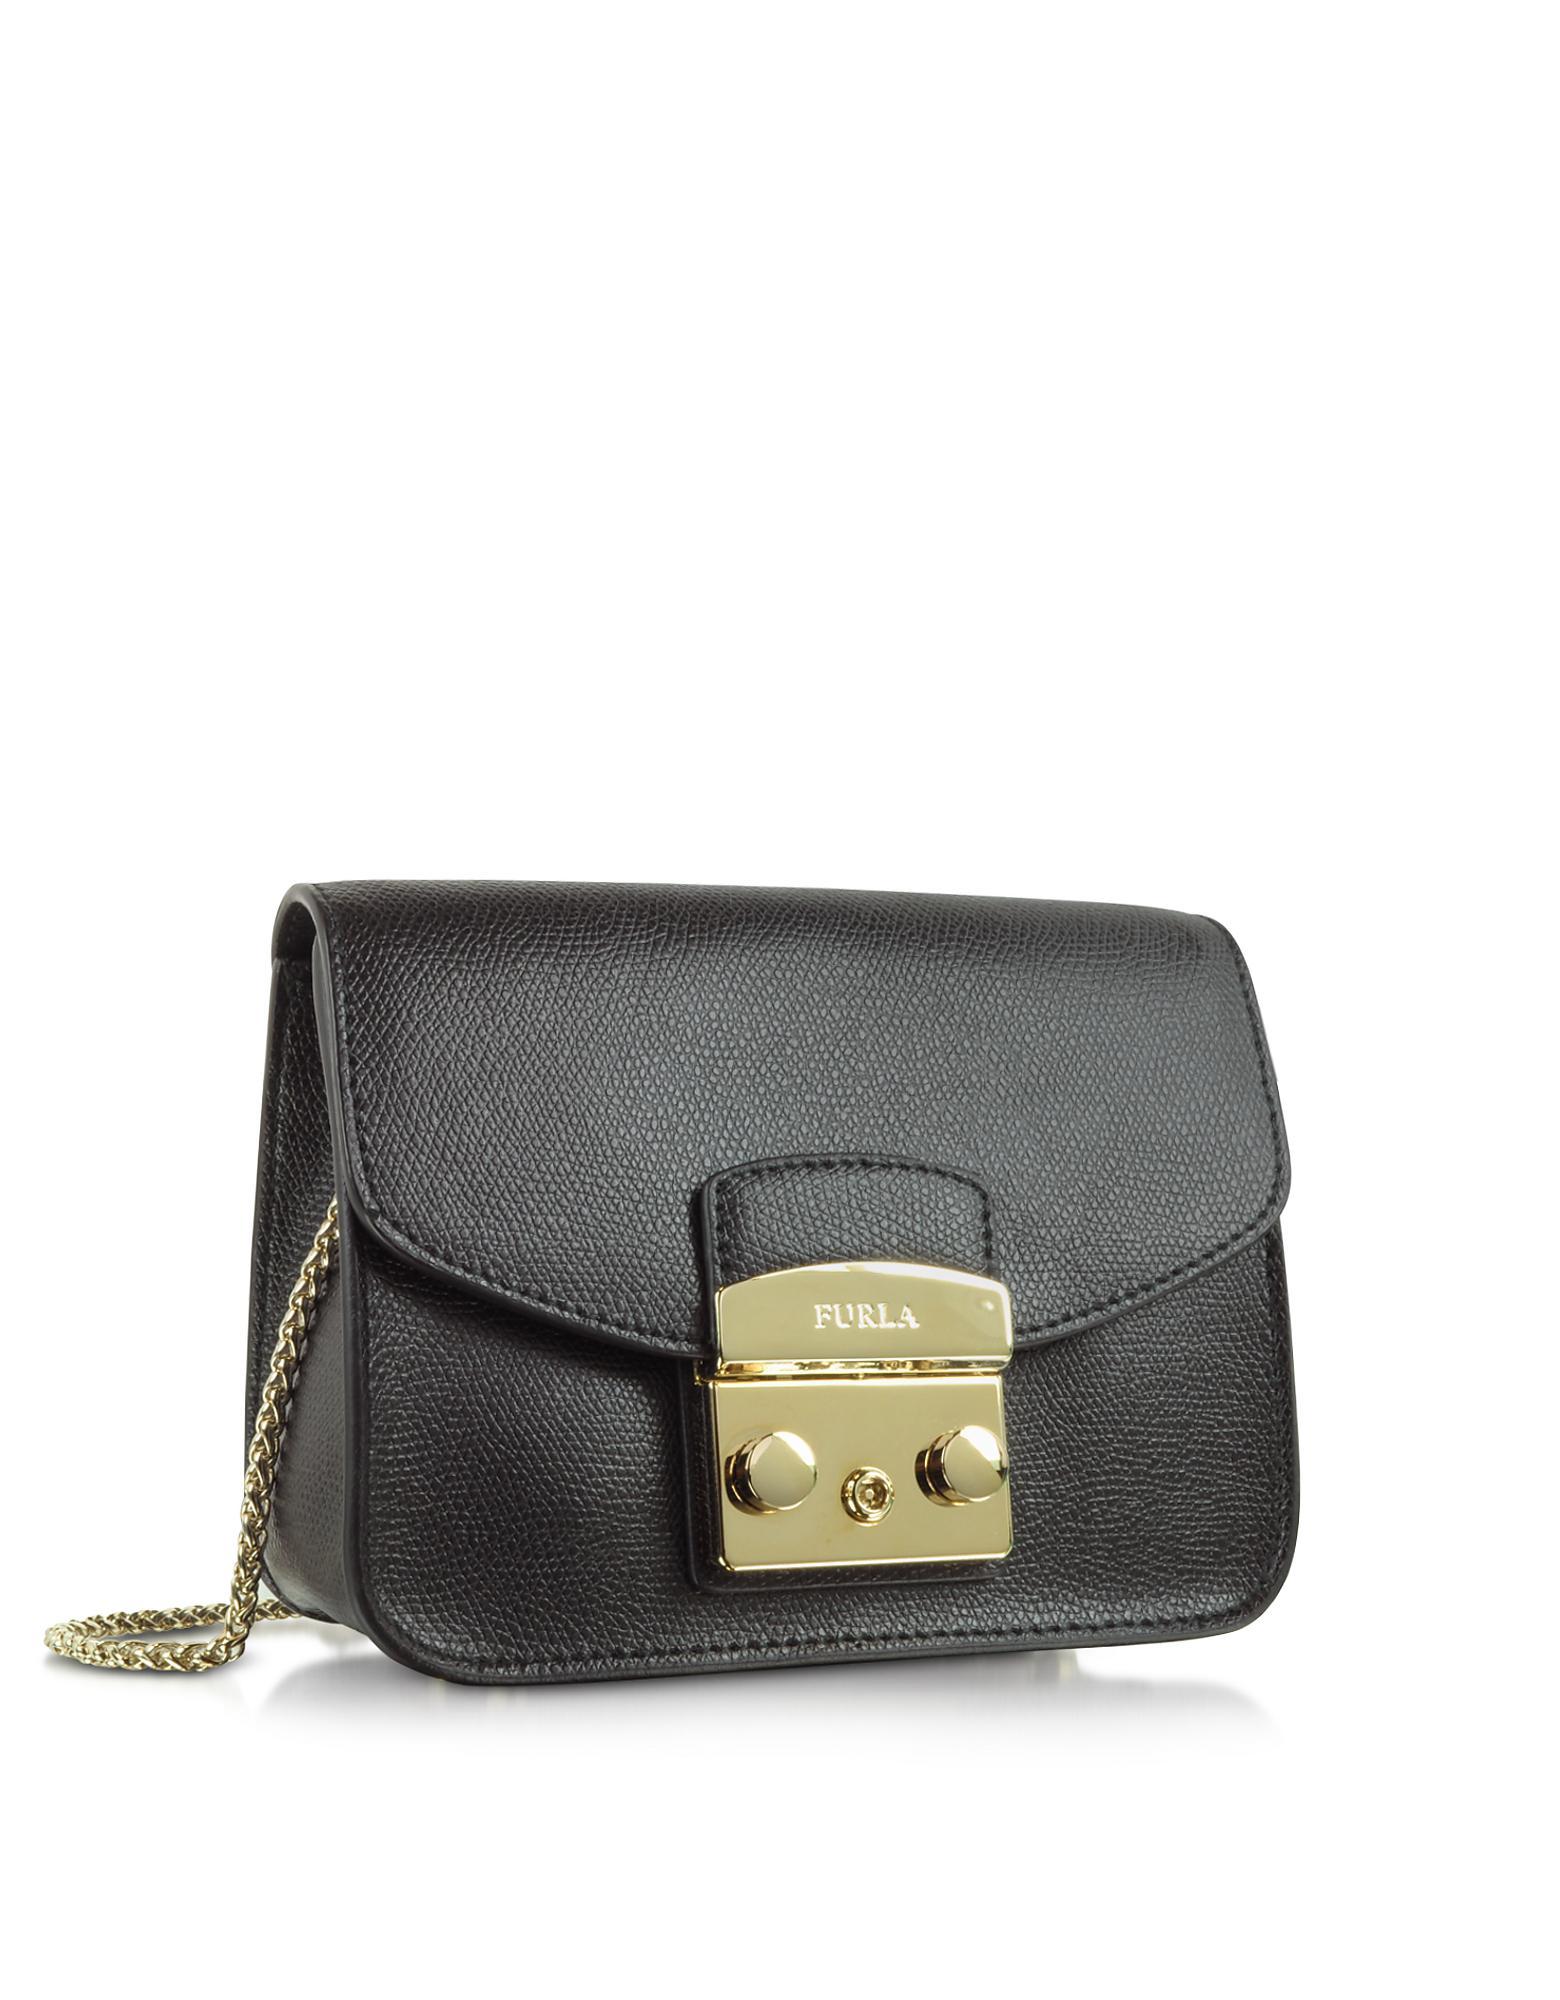 4dfb1fc0697 Lyst - Furla Metropolis Mini Crossbody Bag in Black - Save 32%